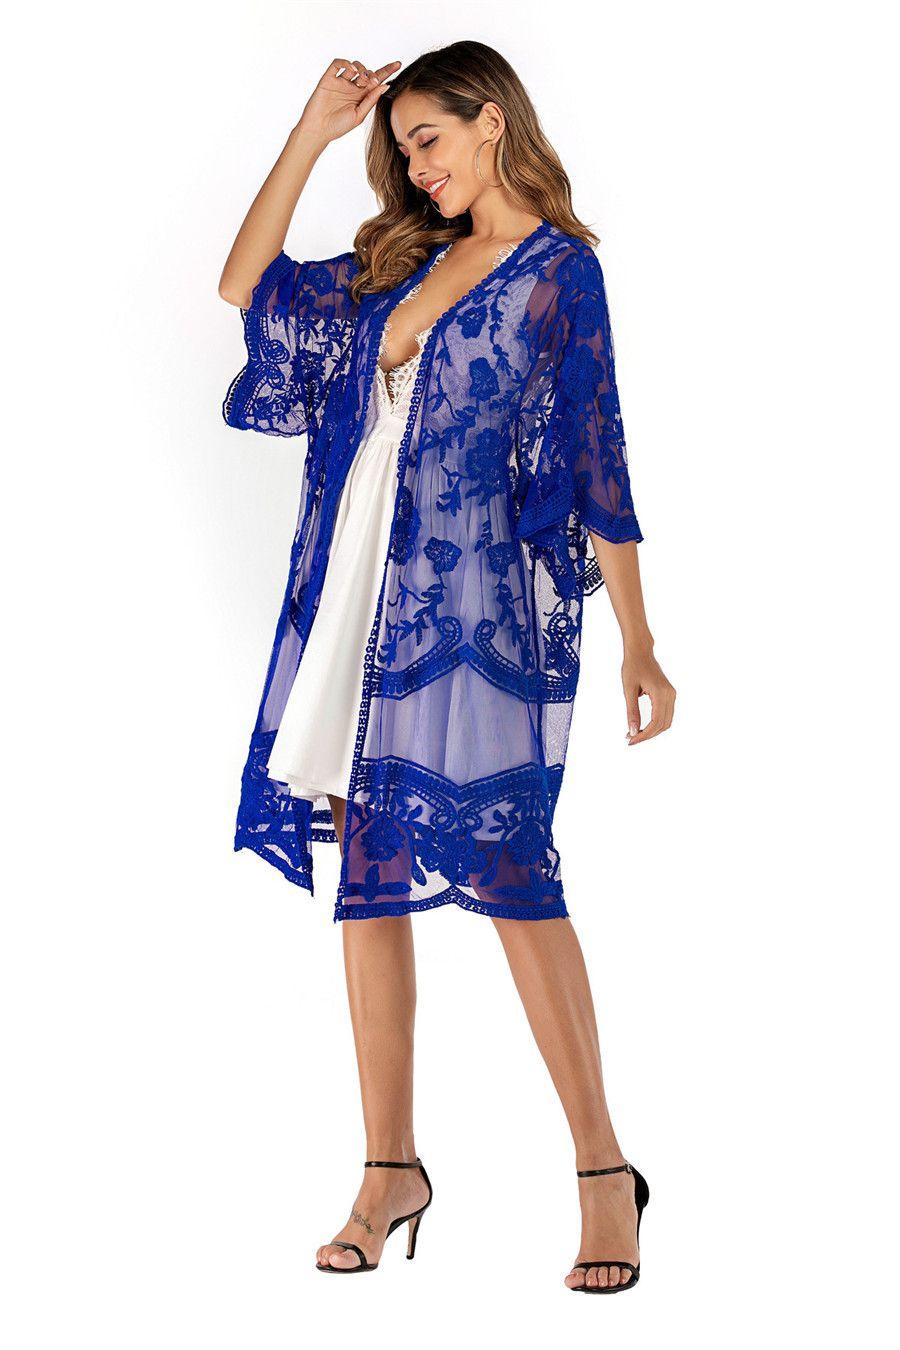 2020 Frauen Beach Wear-Vertuschung-Badebekleidung Badeanzug Sommer Minikleid Lose feste Pareo Vertuschungen